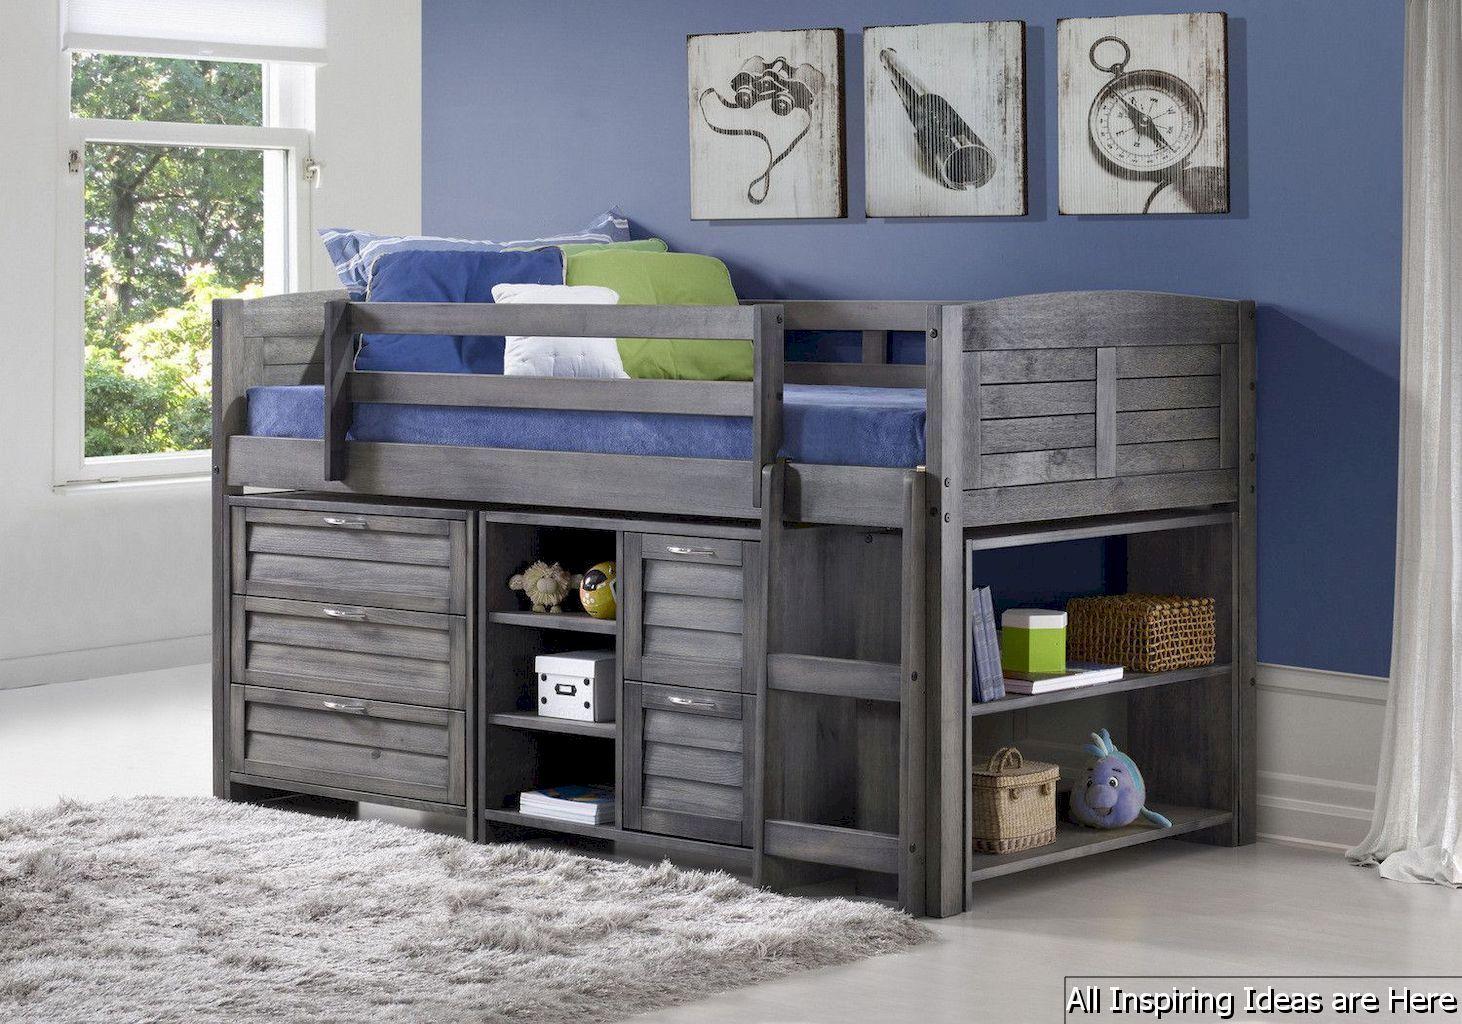 Twin loft bedroom ideas   Stunning Loft Bedroom Design Ideas  Loft bedrooms Lofts and